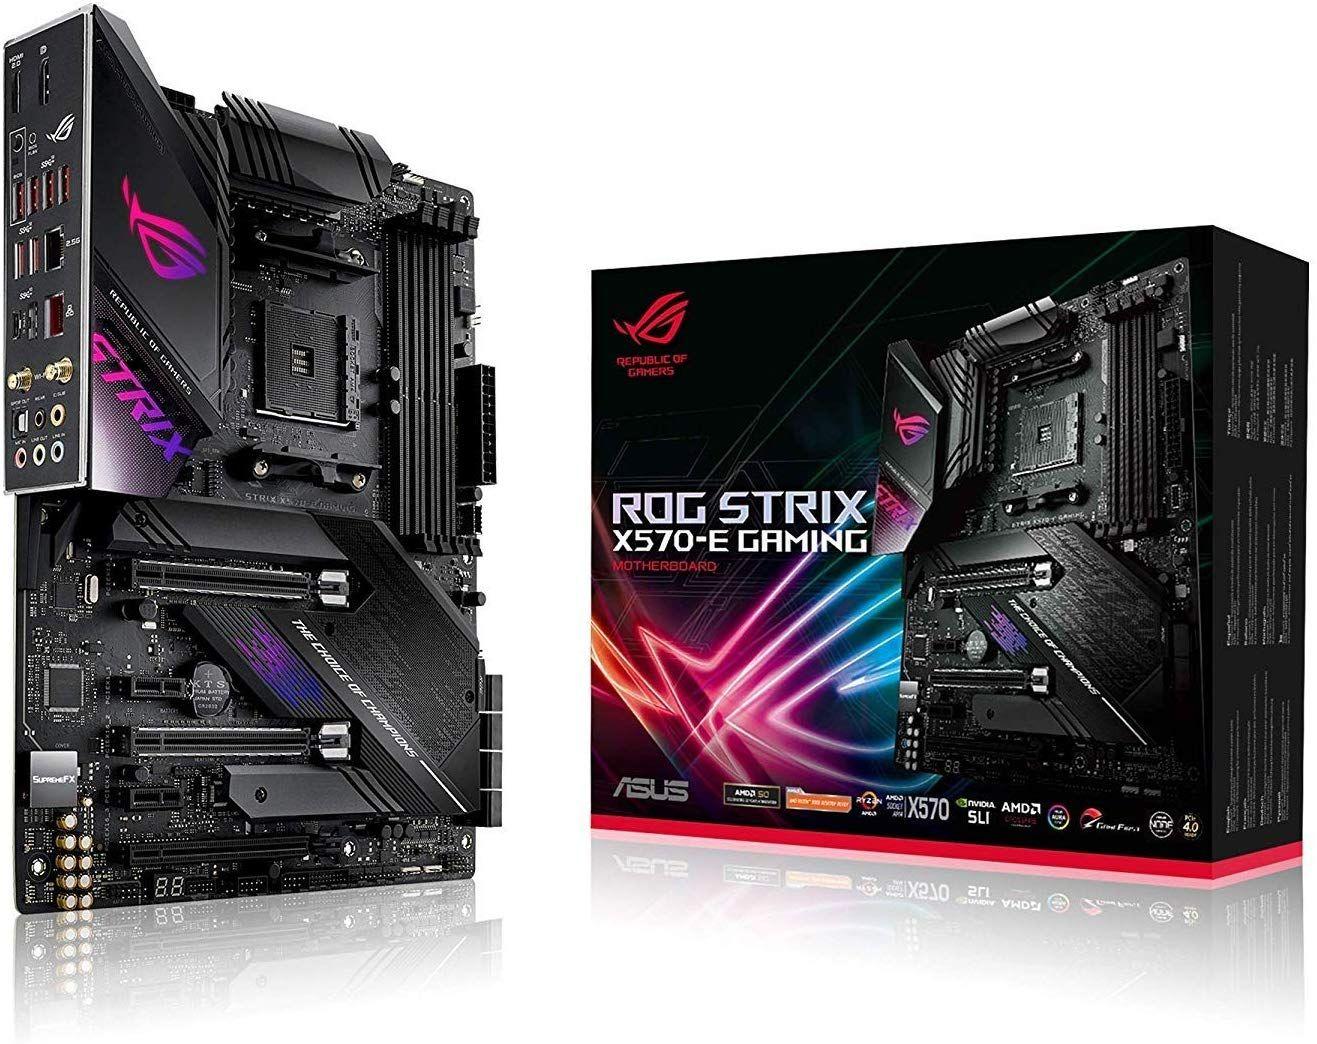 ASUS AMD ROG STRIX X570-E MOTHERBOARD £304.99 @ Amazon